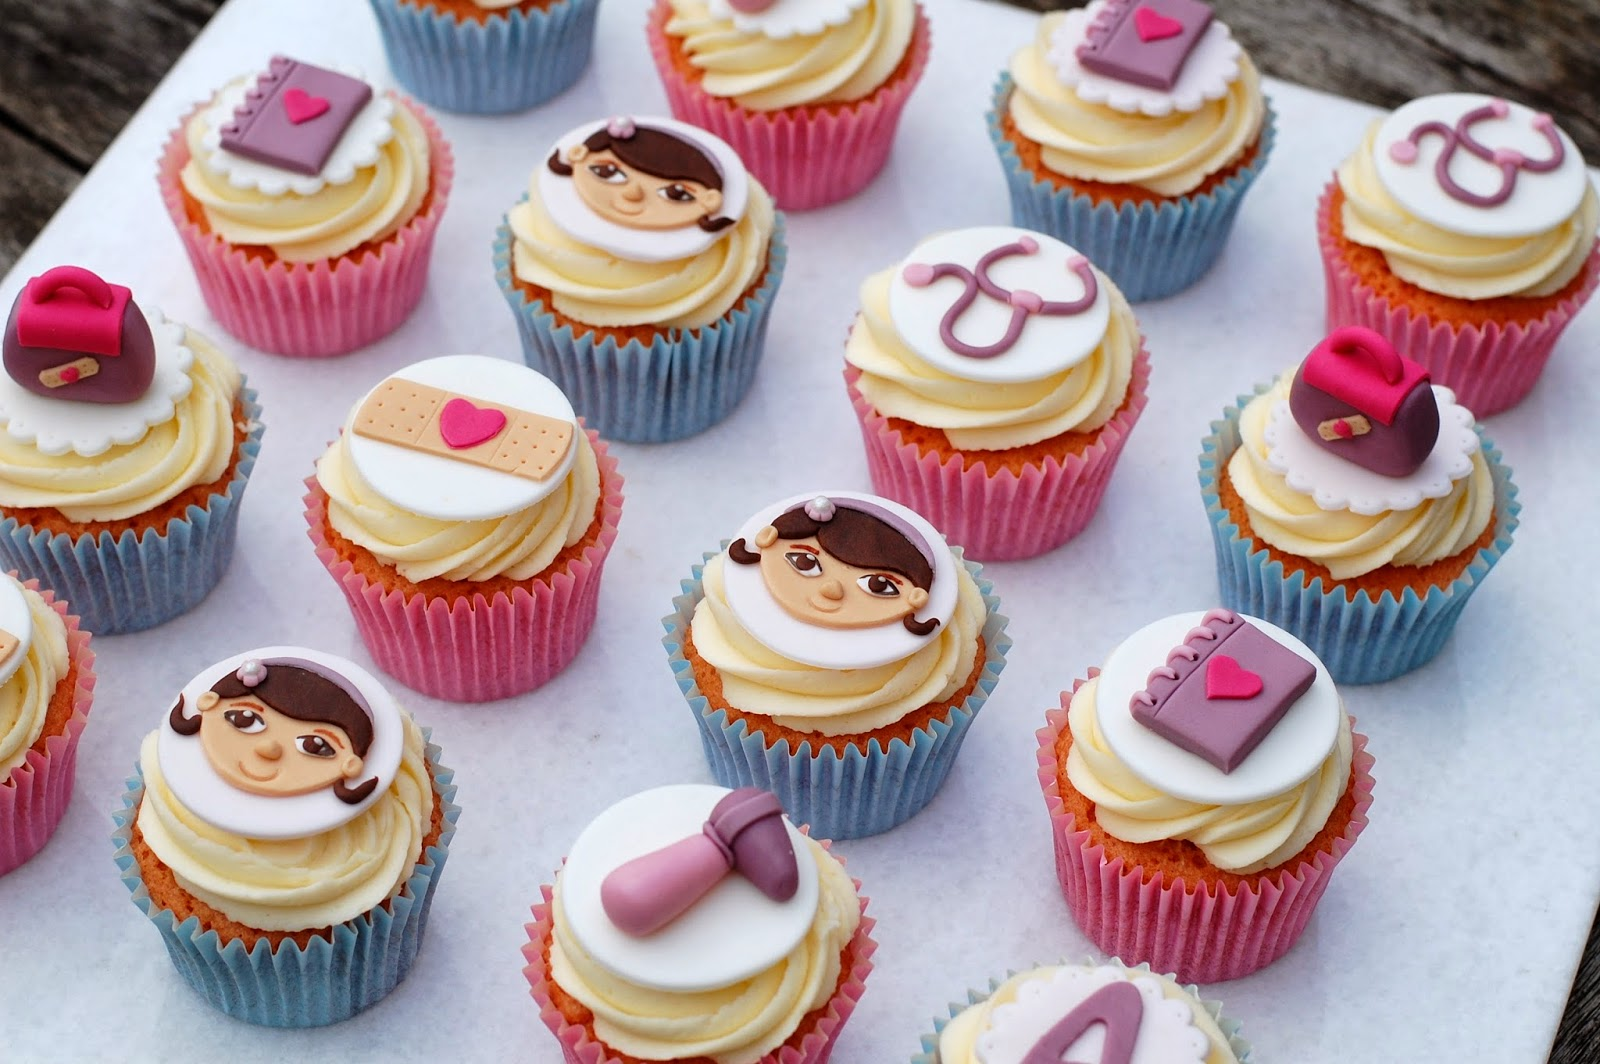 Swell Doc Mcstuffins Cupcakes Vanilla Frost Cakes Funny Birthday Cards Online Elaedamsfinfo